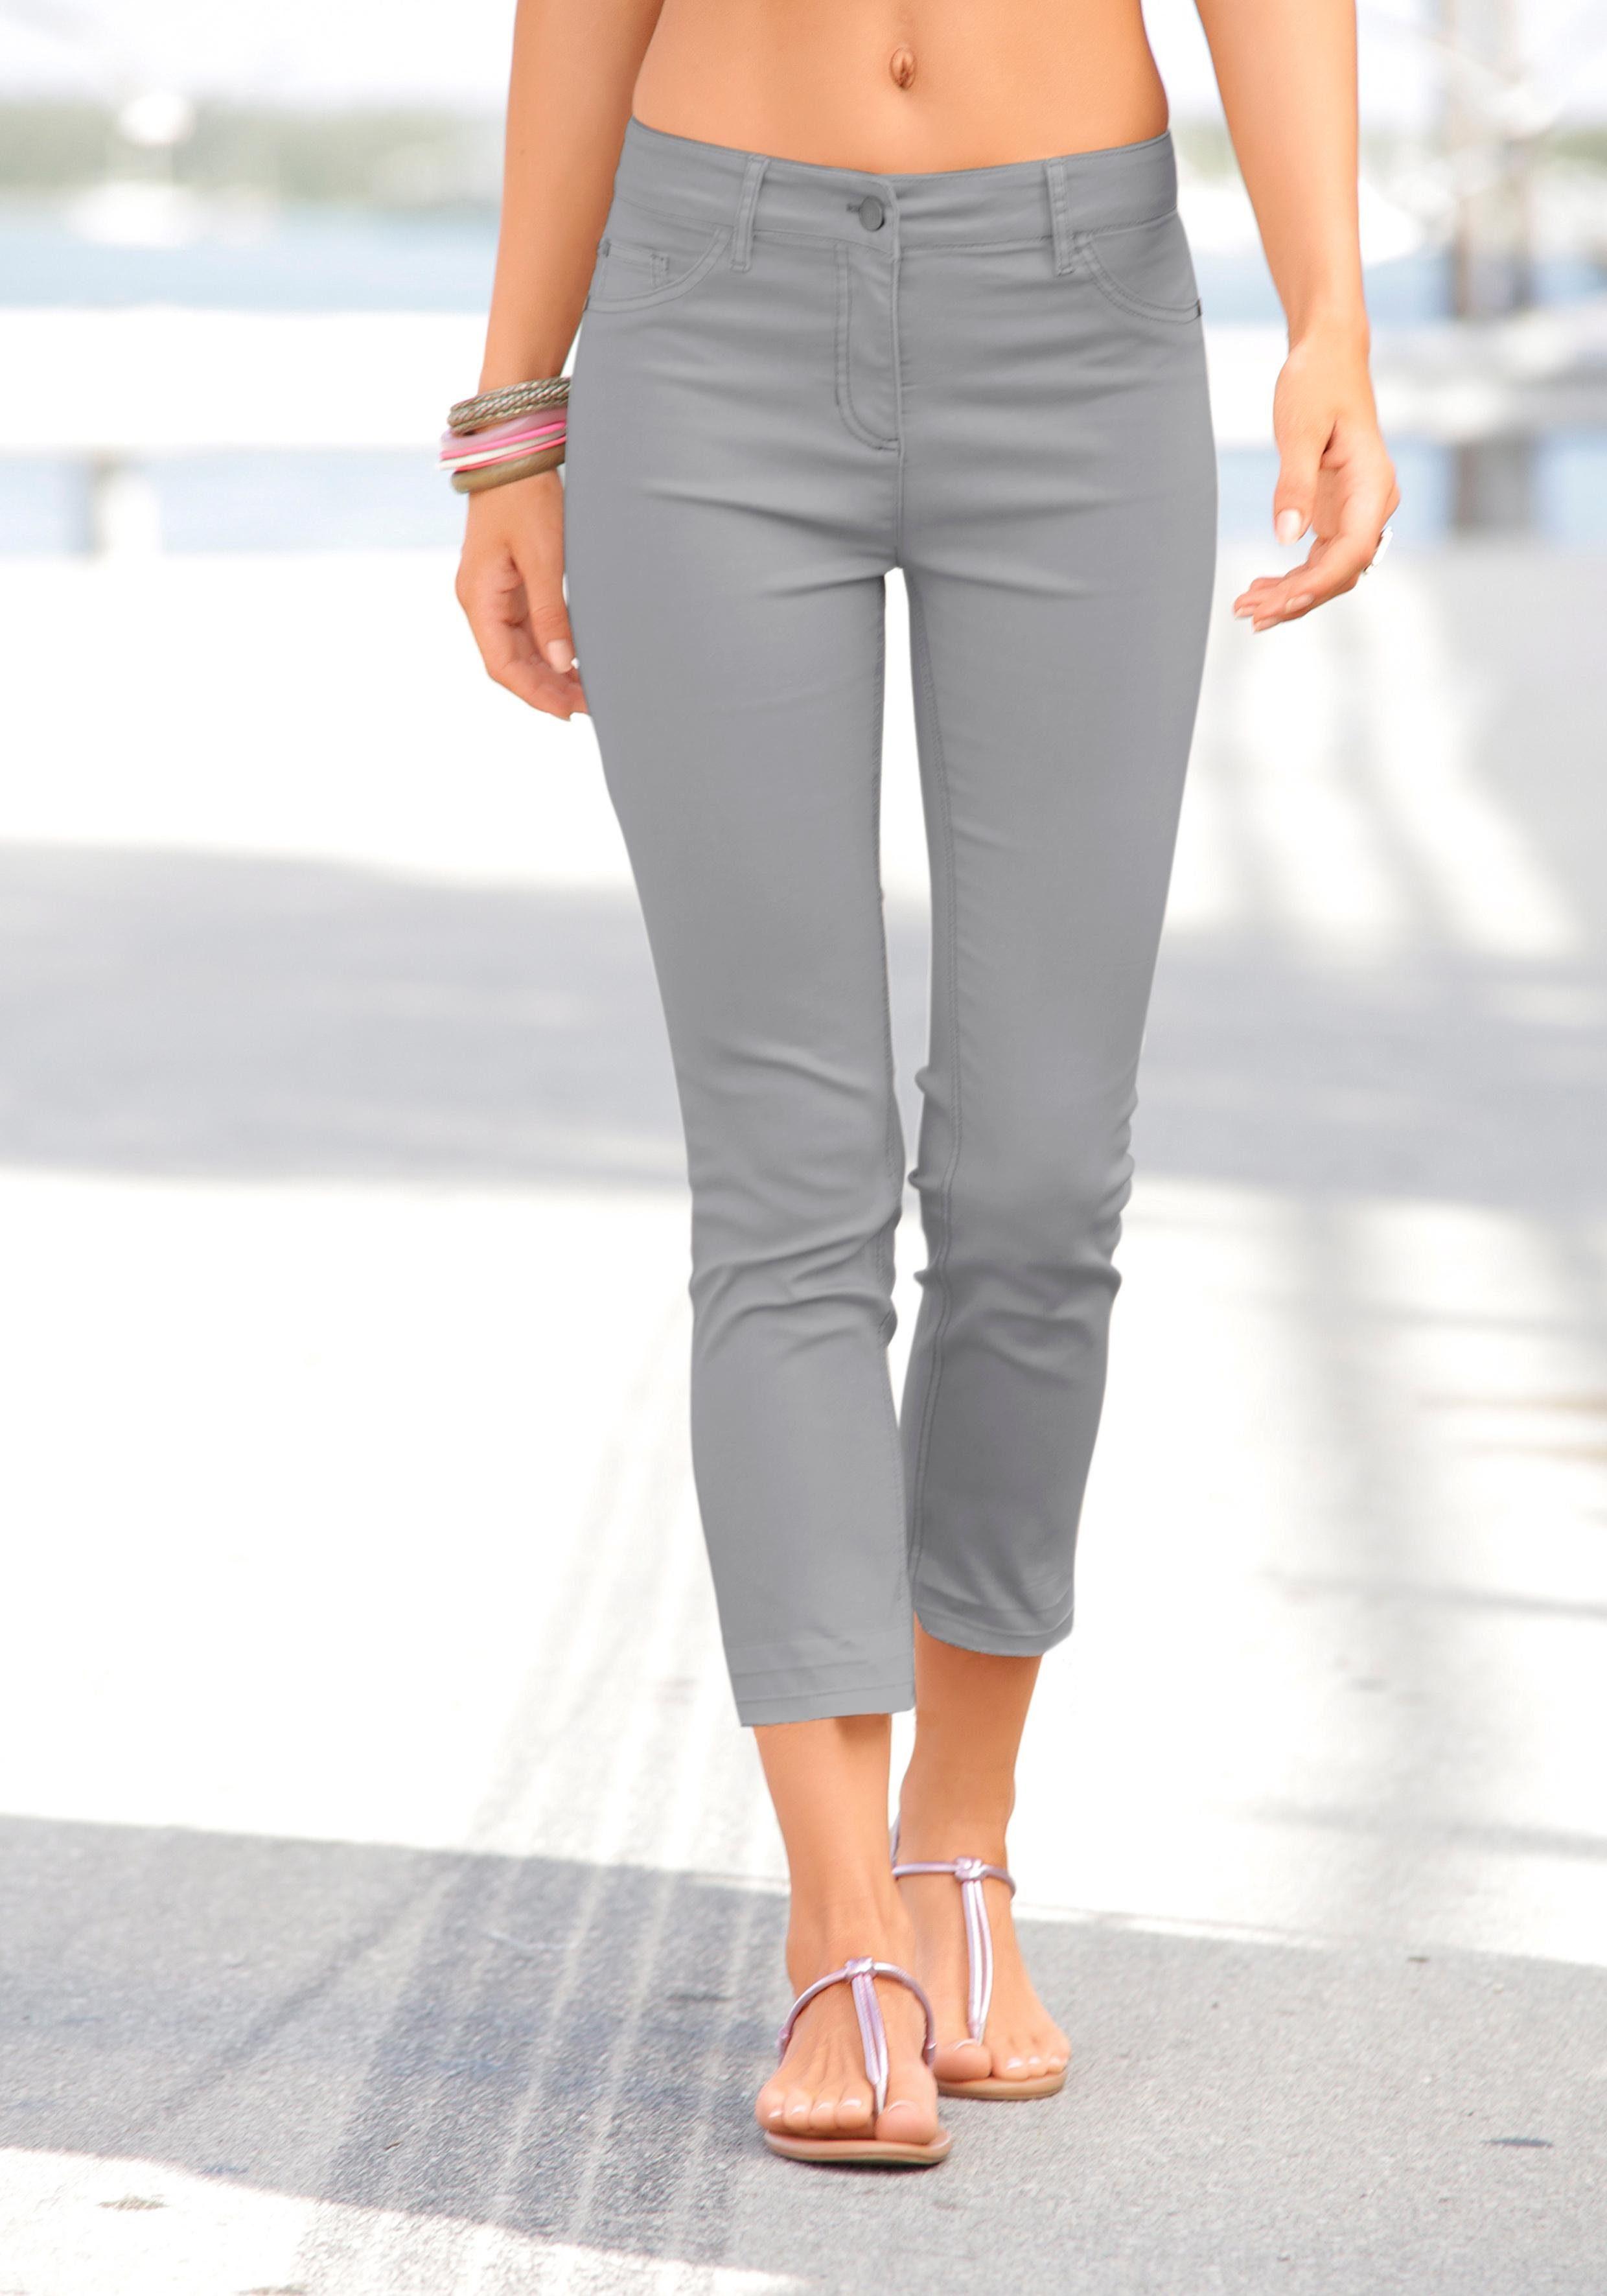 Zero Jeans Stretch Gr 34-38 in Weiß 7//8 Länge NEU